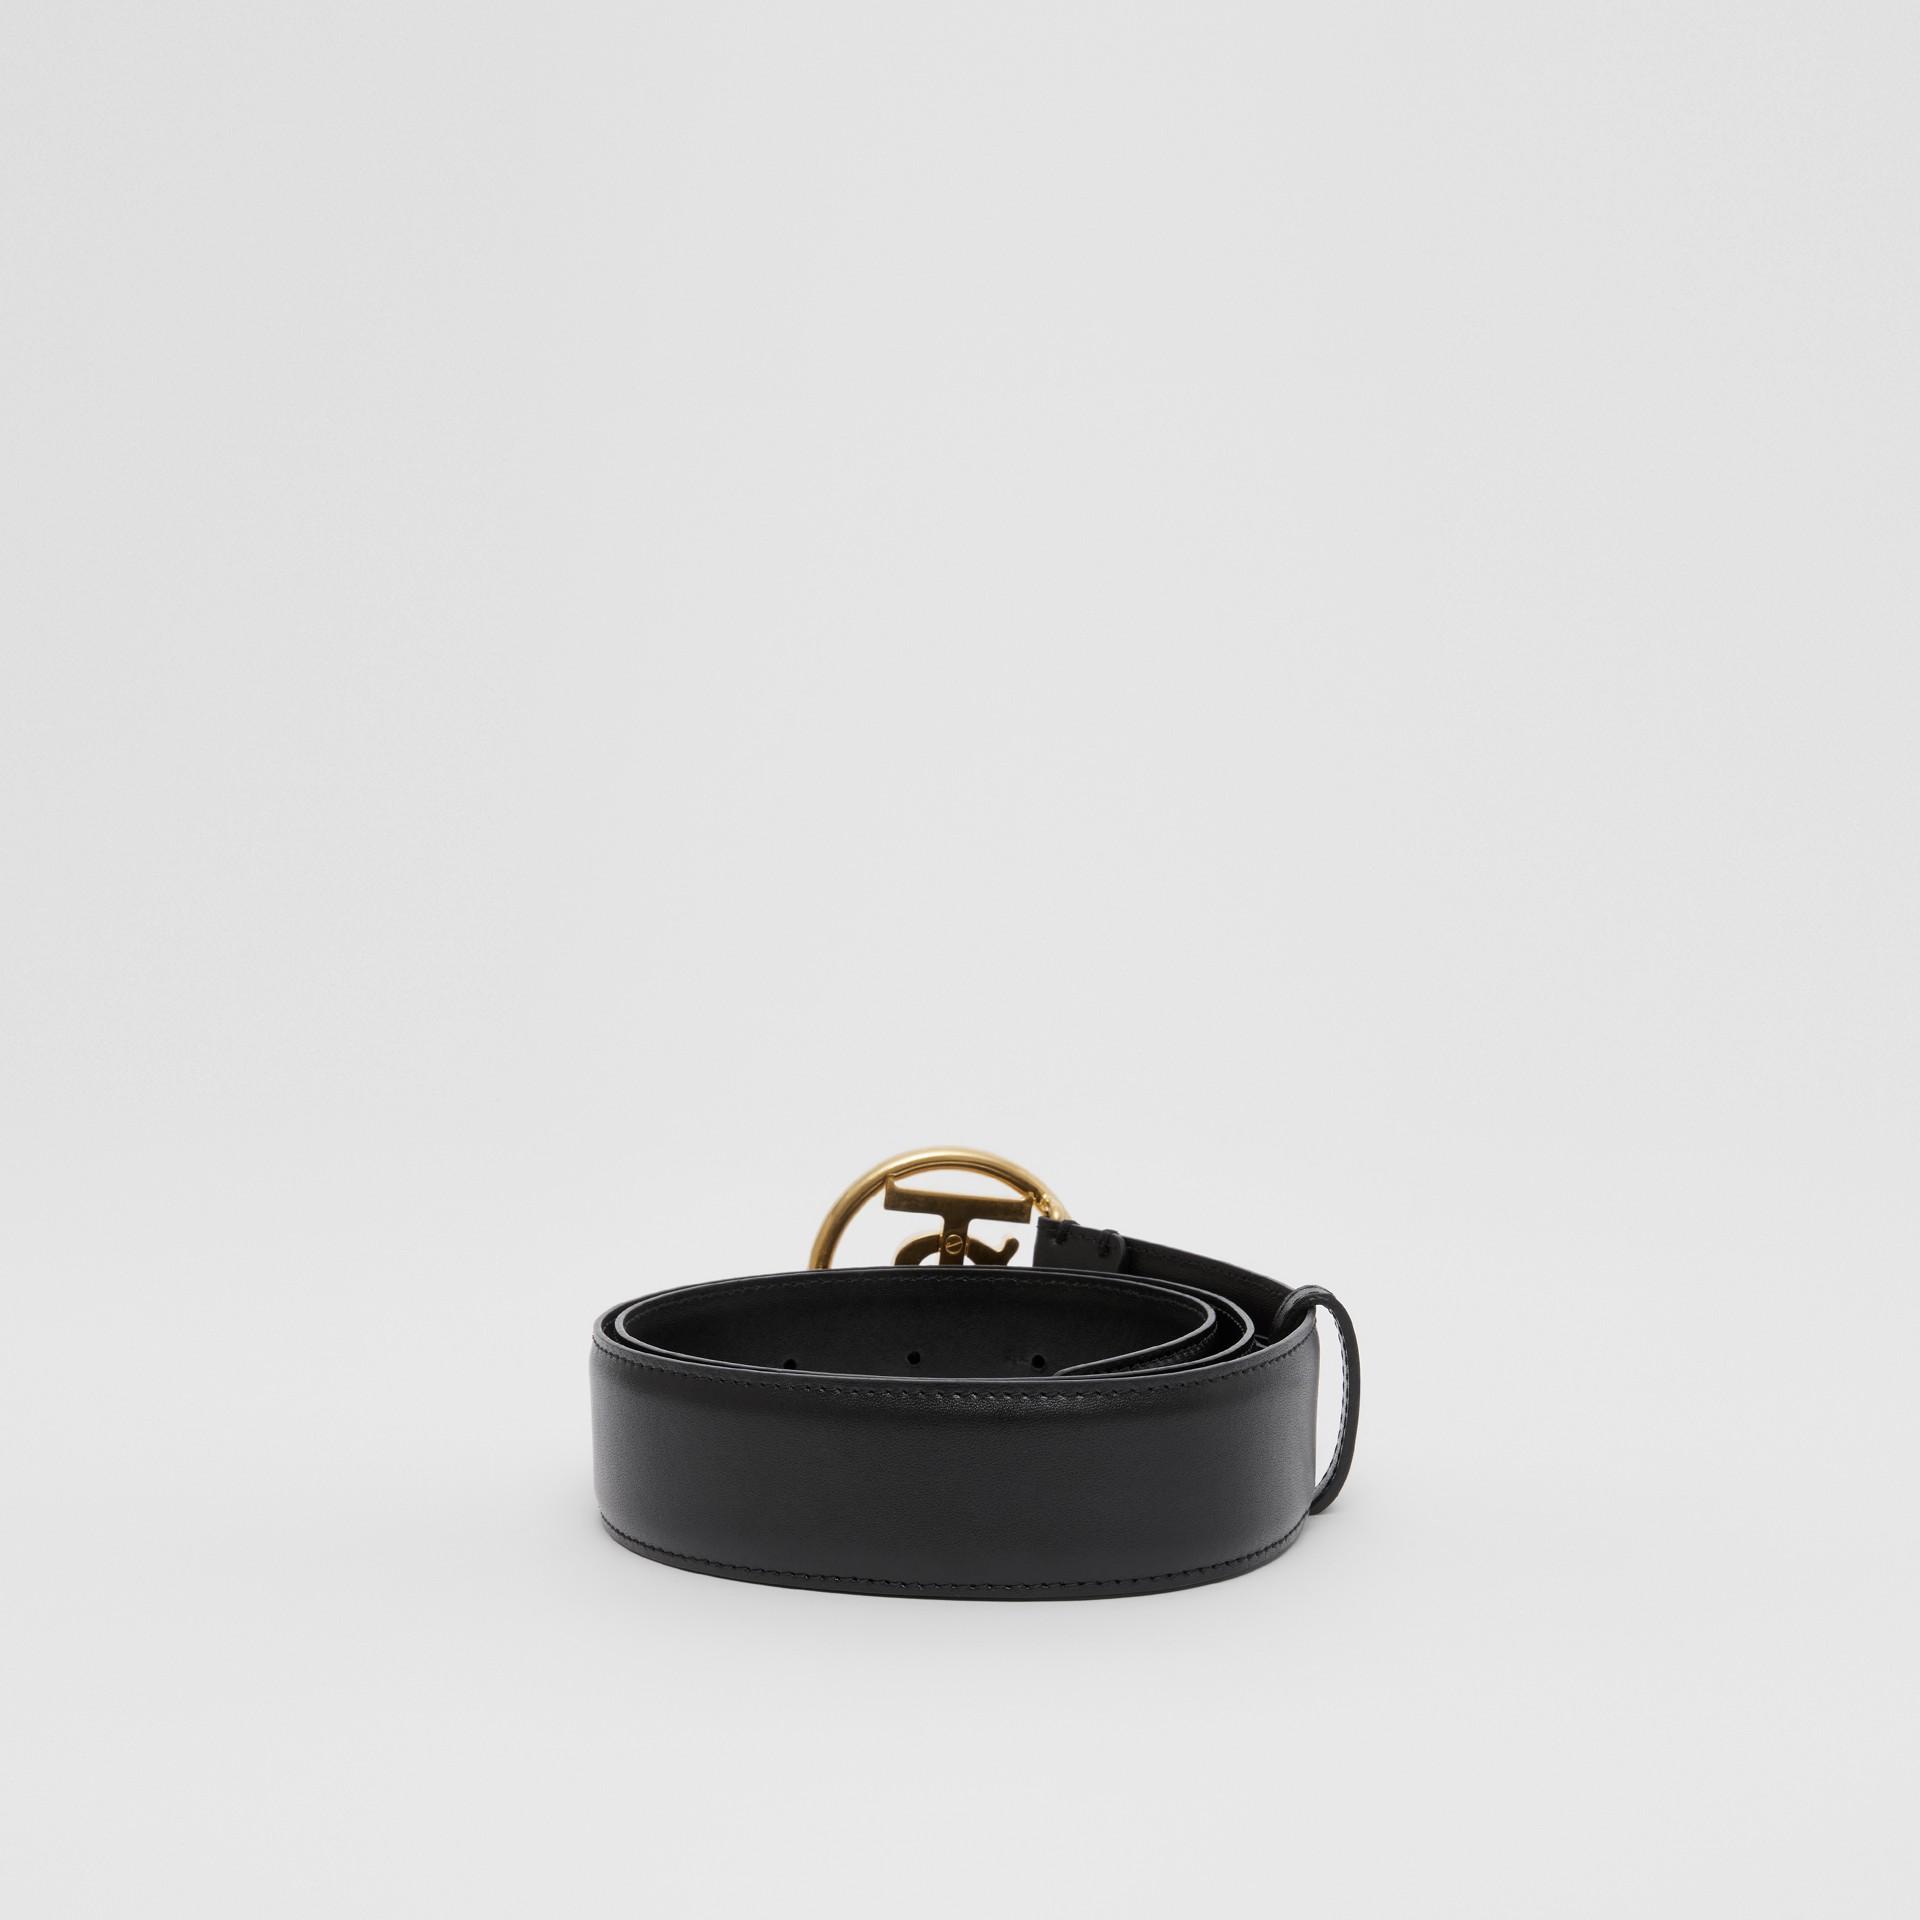 Monogram Motif Leather Belt in Black - Women | Burberry - gallery image 4